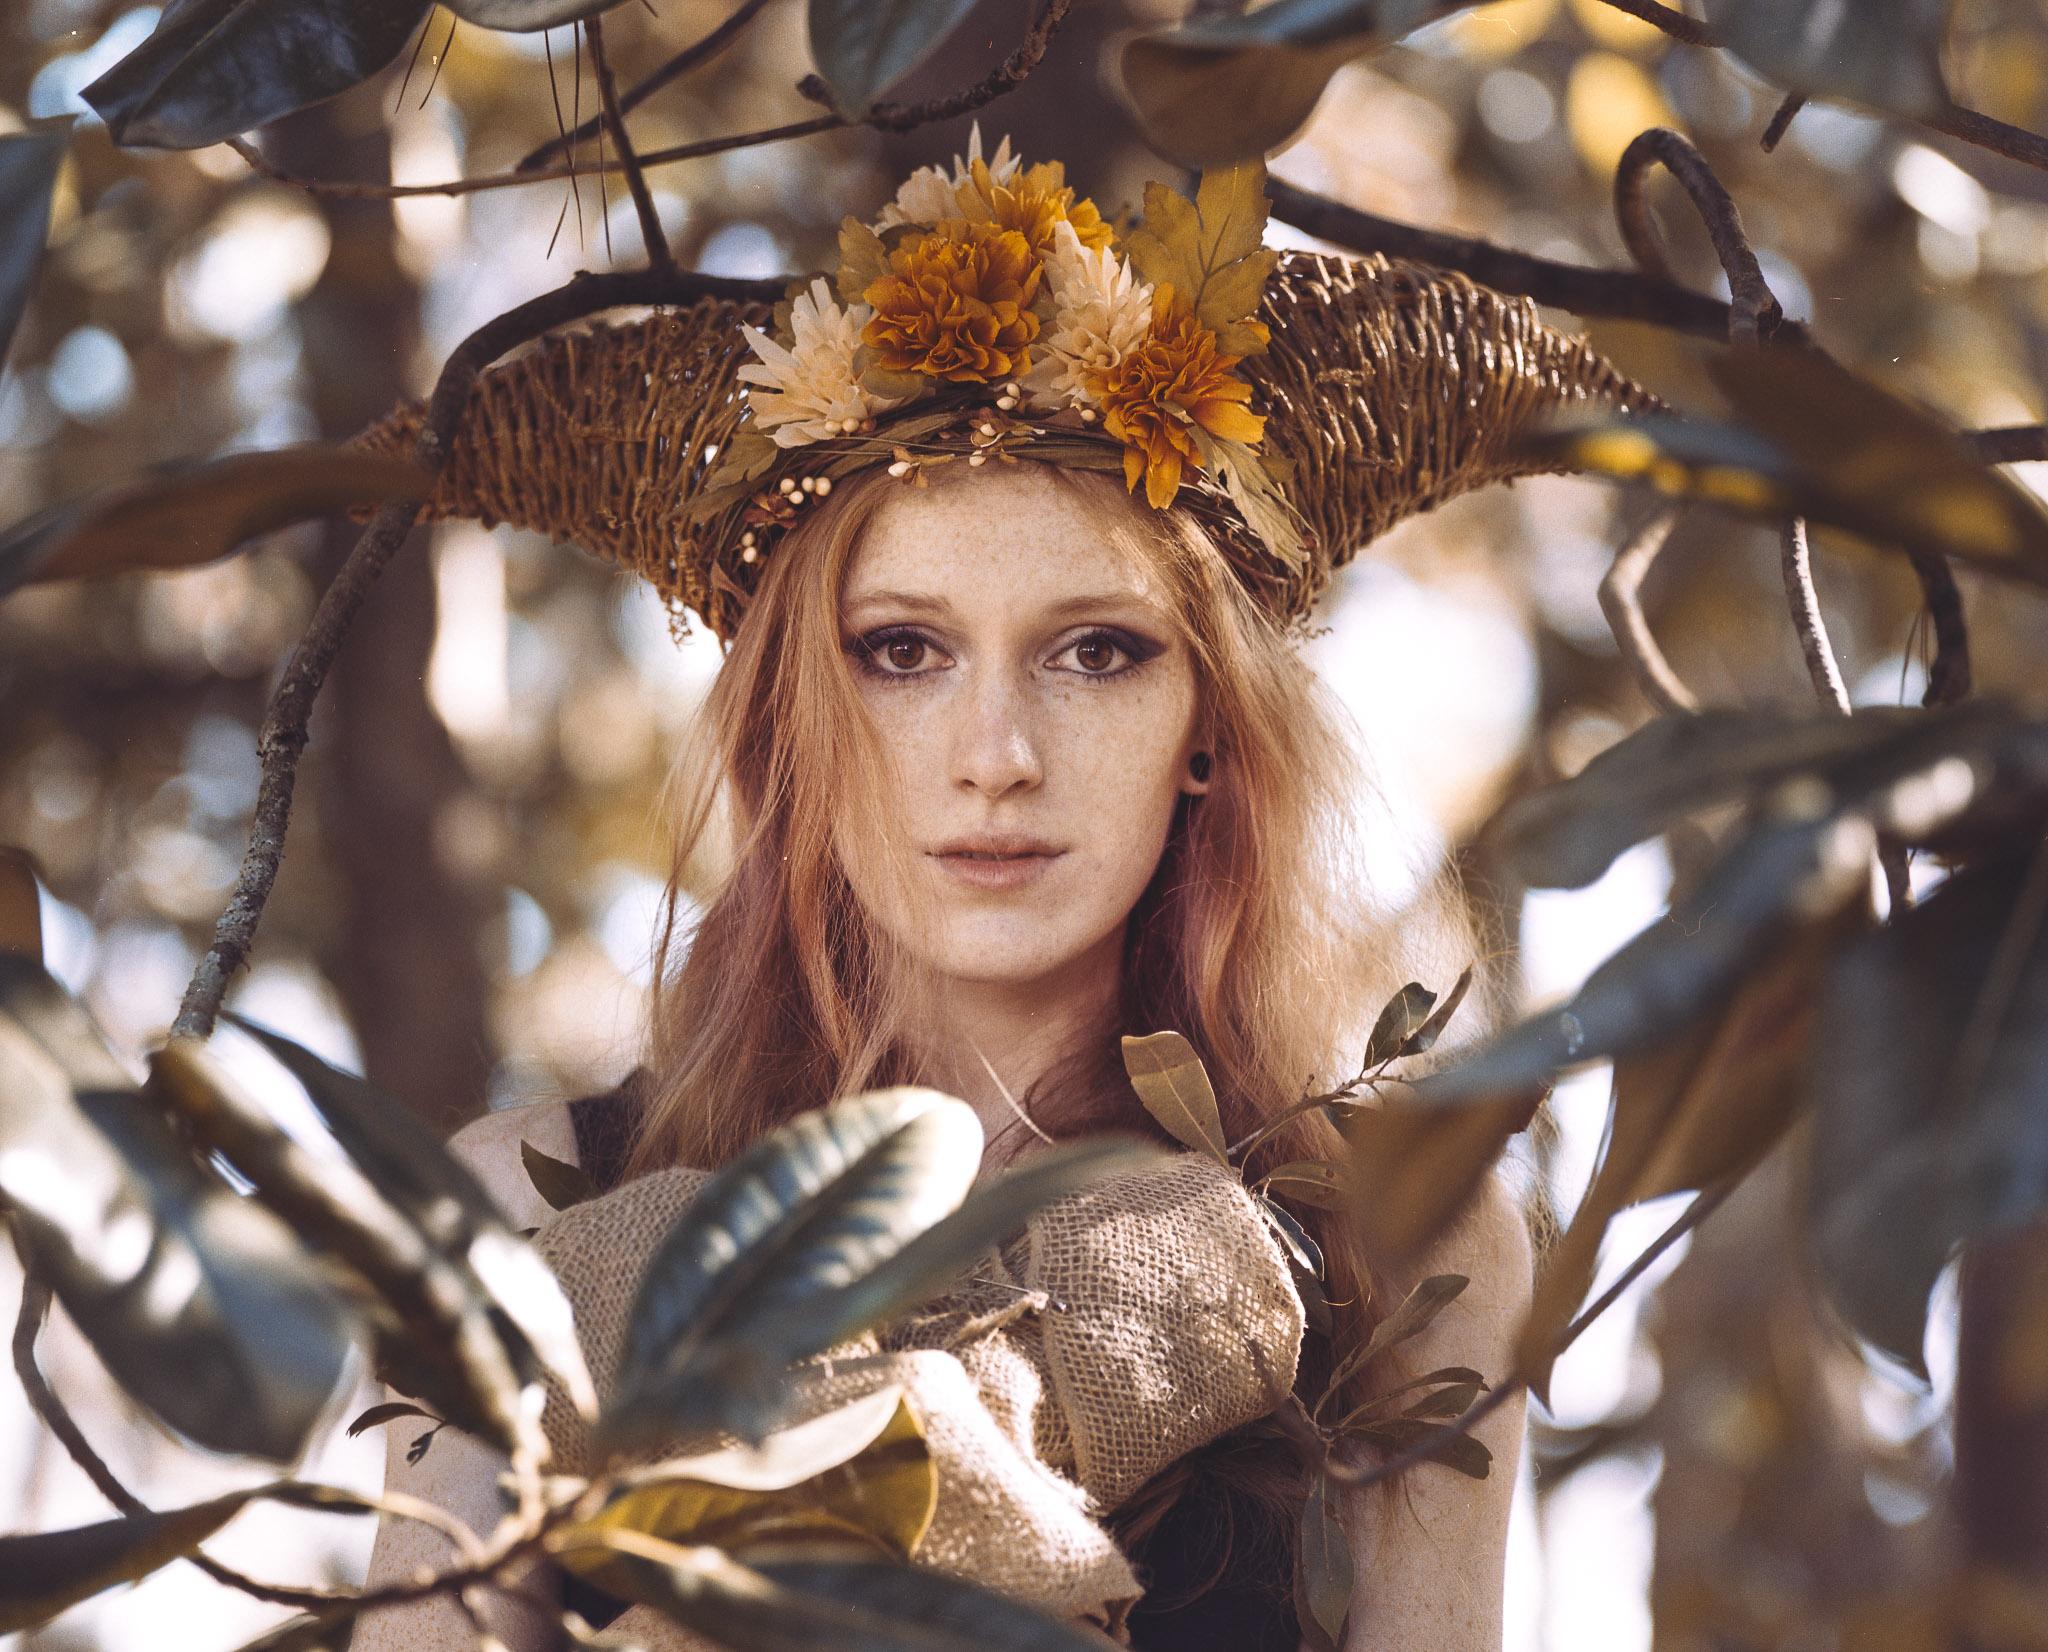 Model: Meagan Hamilton  Camera: Mamiya RB67  Film: Portra 400